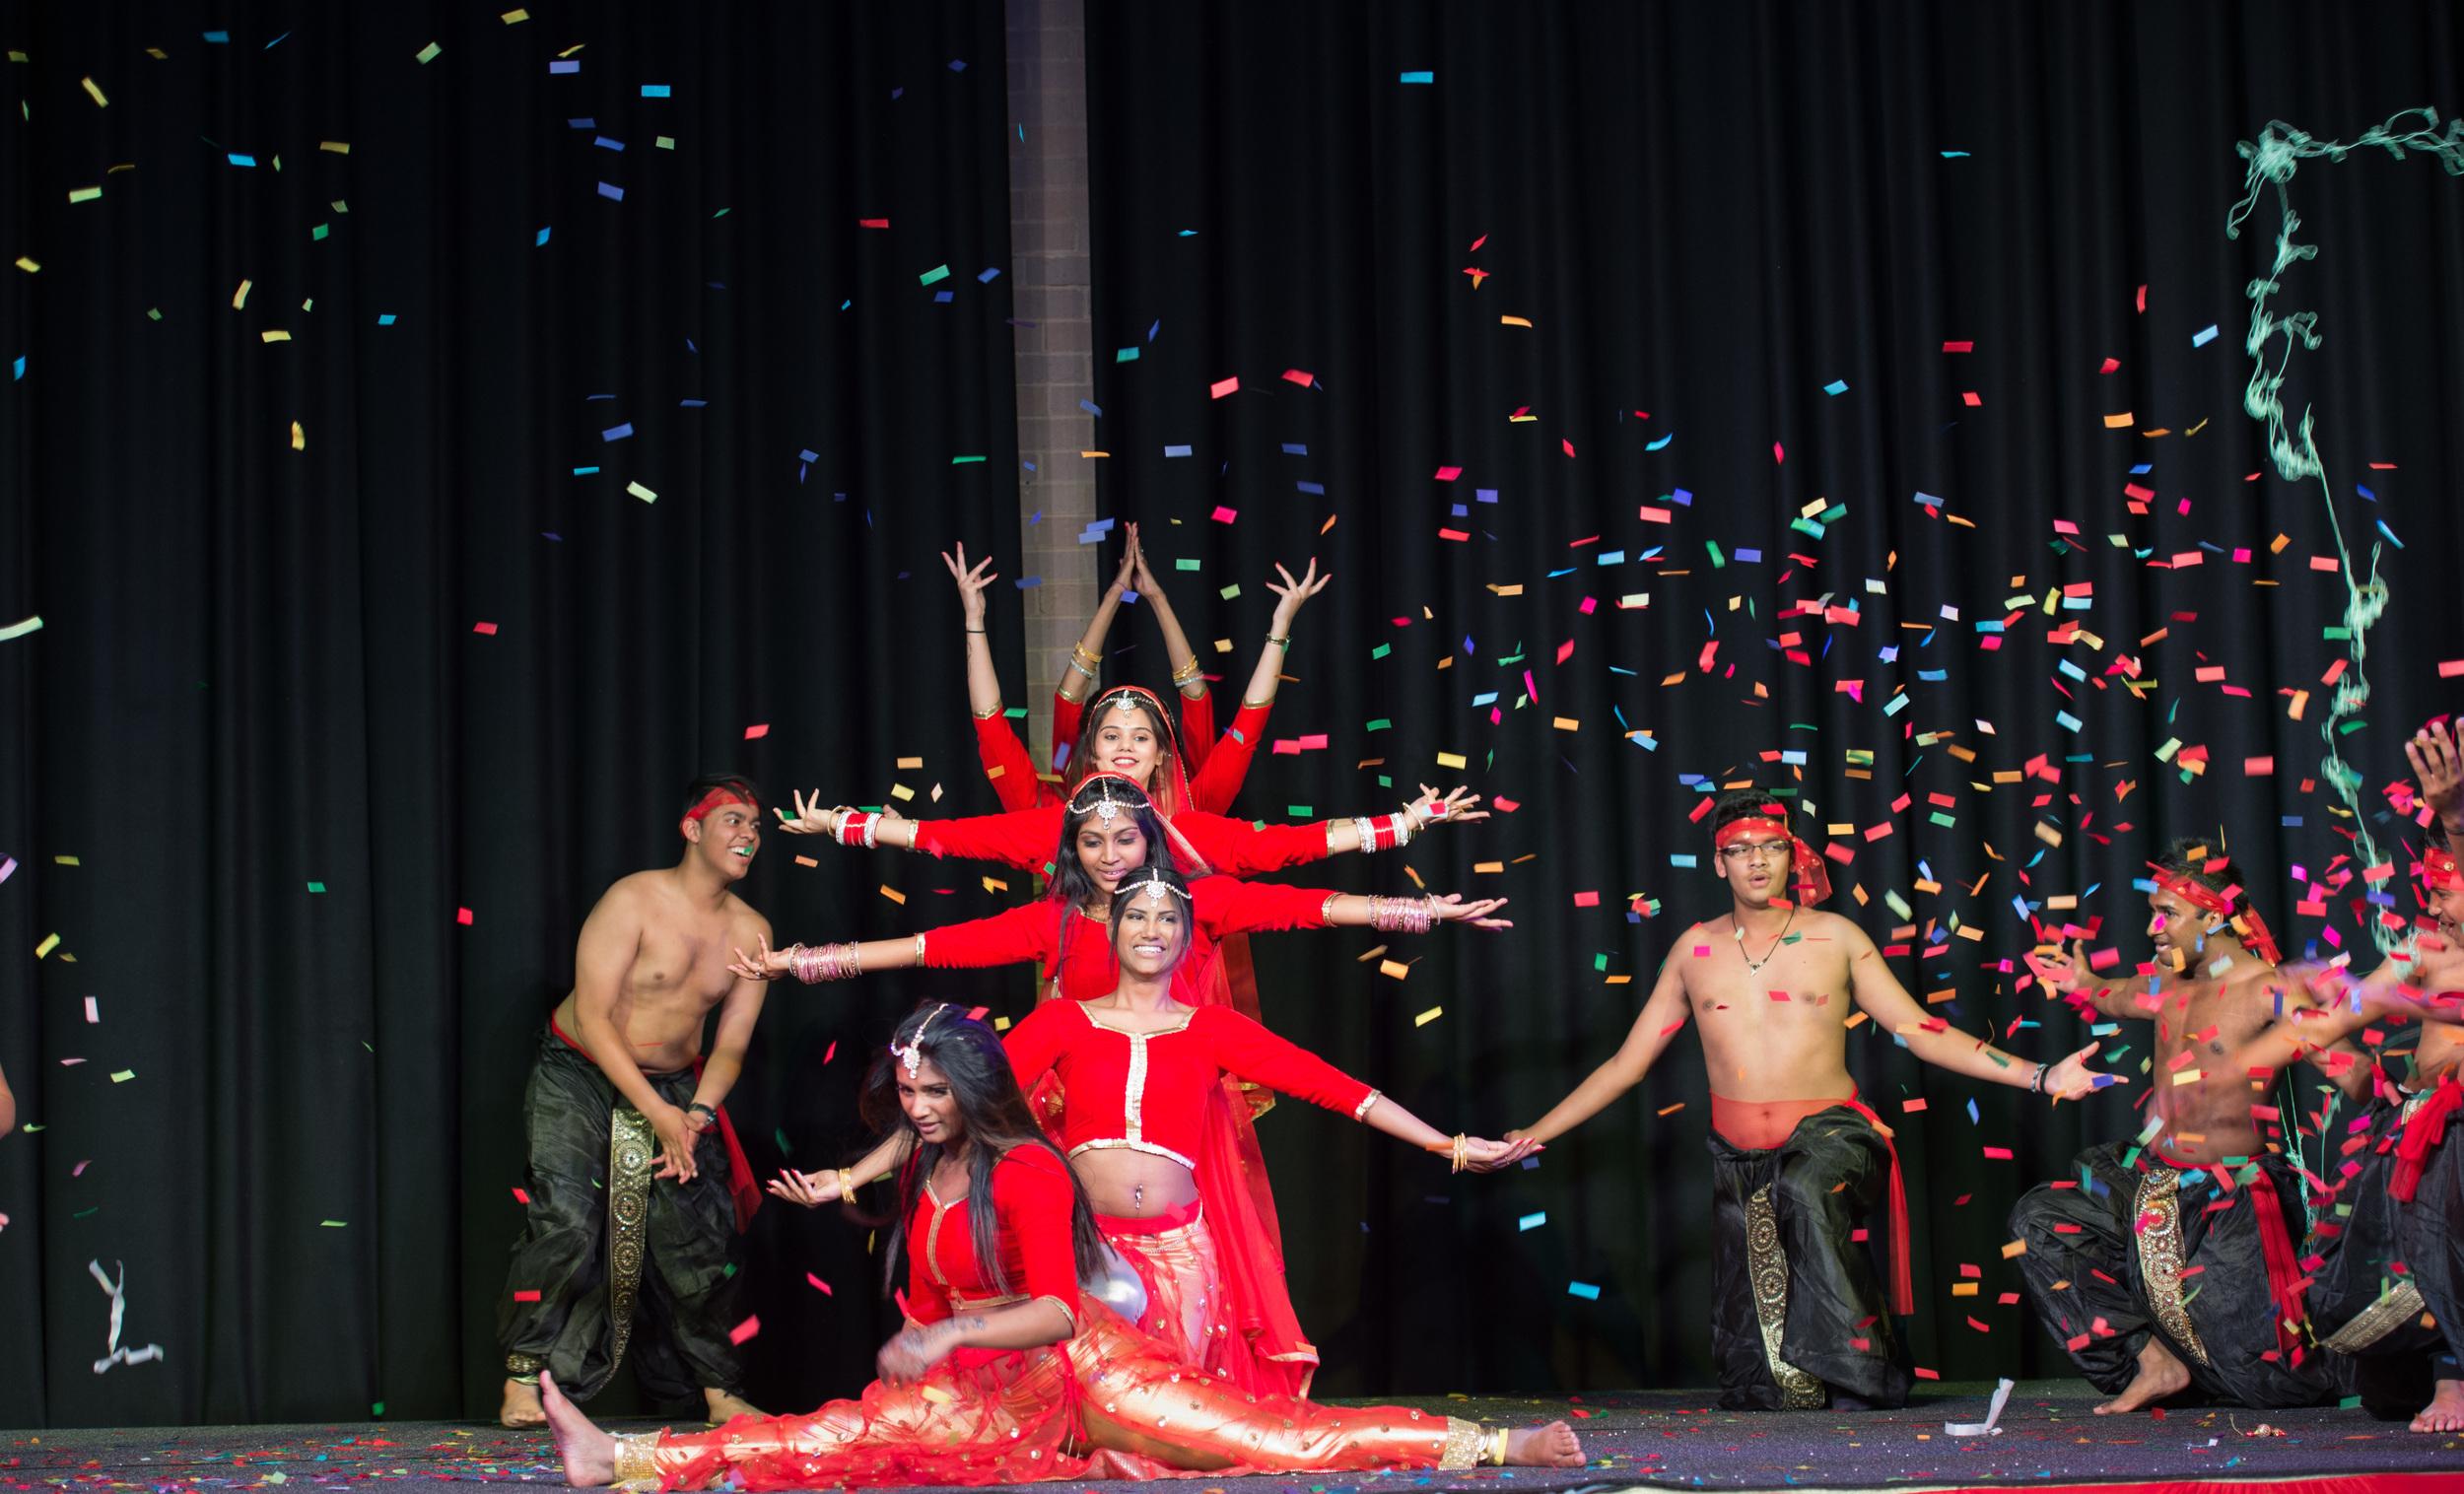 Handheld Confetti Cannons shot during cultural performance Diwali - Blaso Pyrotechnics, Melbourne, Australia